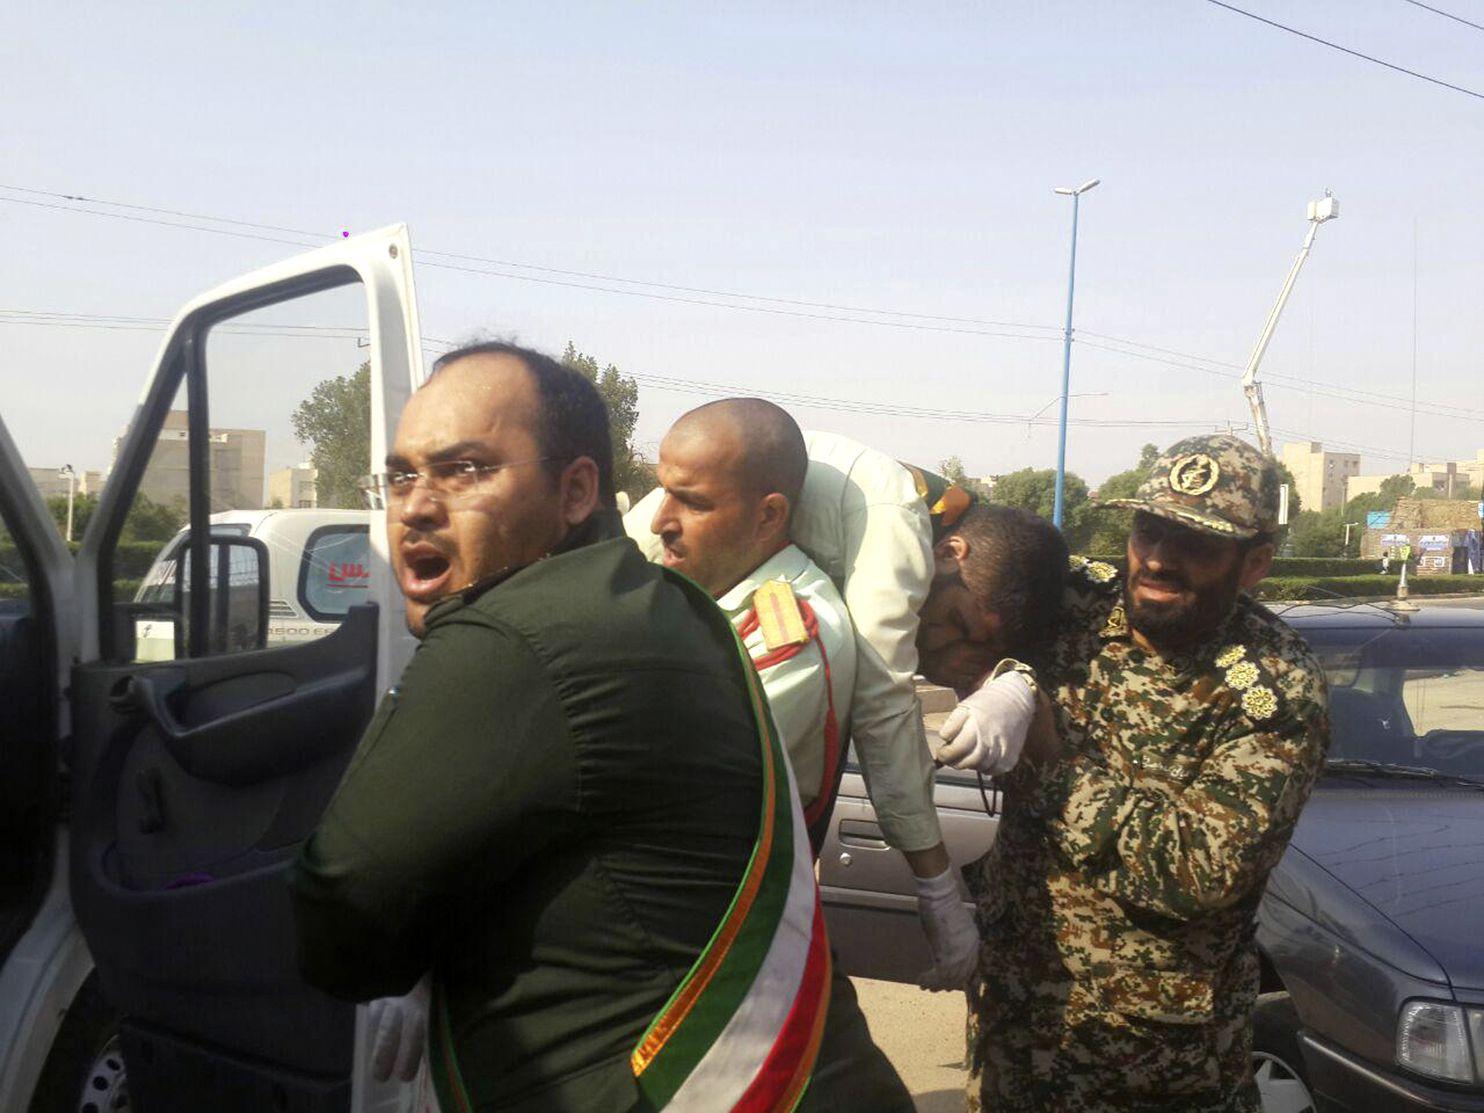 Islamic State claims killing of 29 at Iran military parade